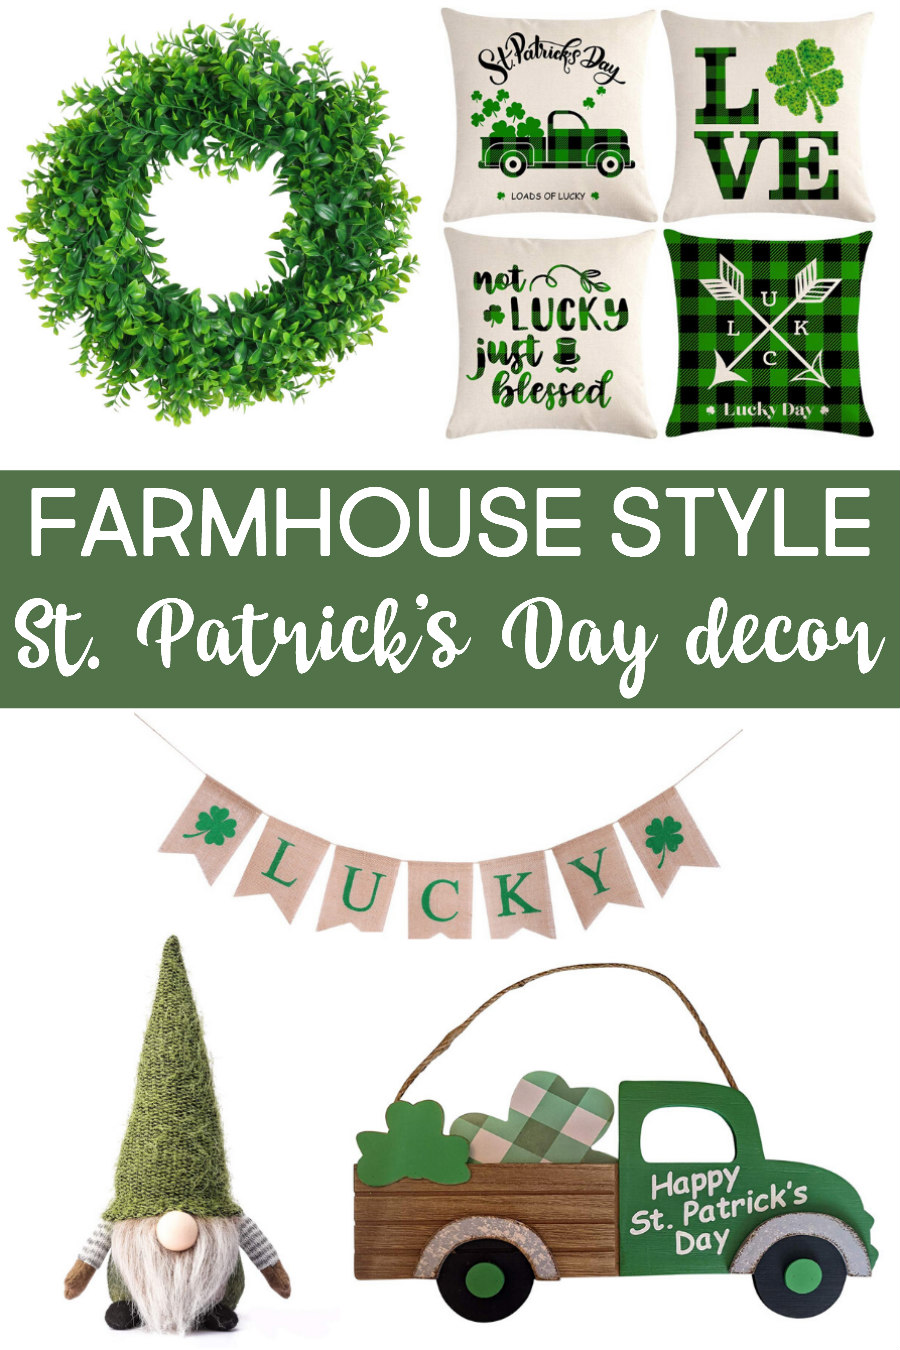 farmhouse st. patrick's day decor